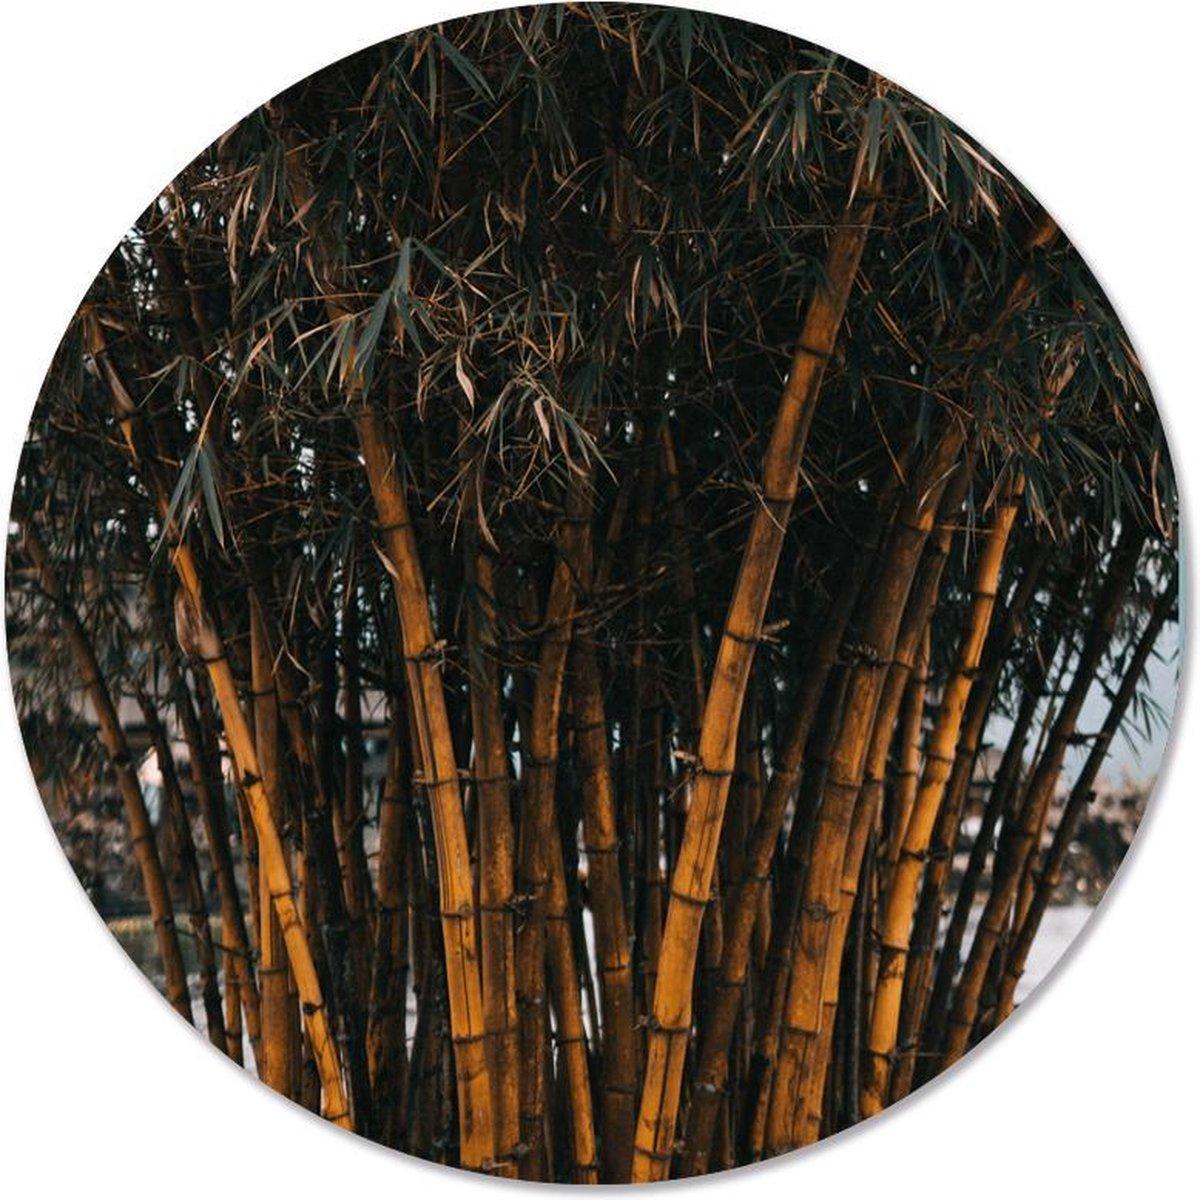 Label2X Muurcirkel bamboo - Ø 12 cm - Dibond (binnen & buiten)